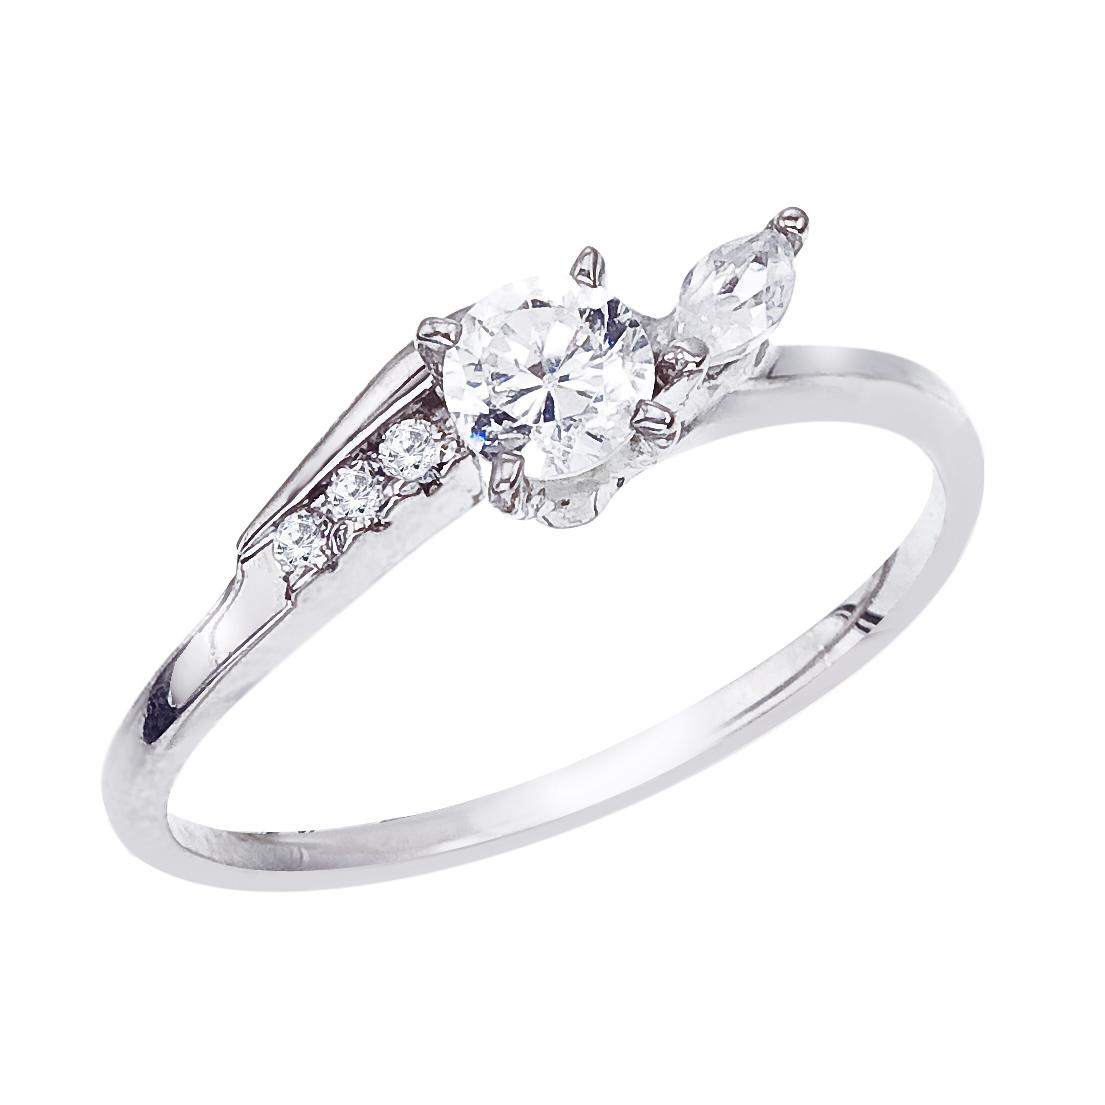 14k White gold Classic Diamond QPID Engagement Ring (0.59 tcw)